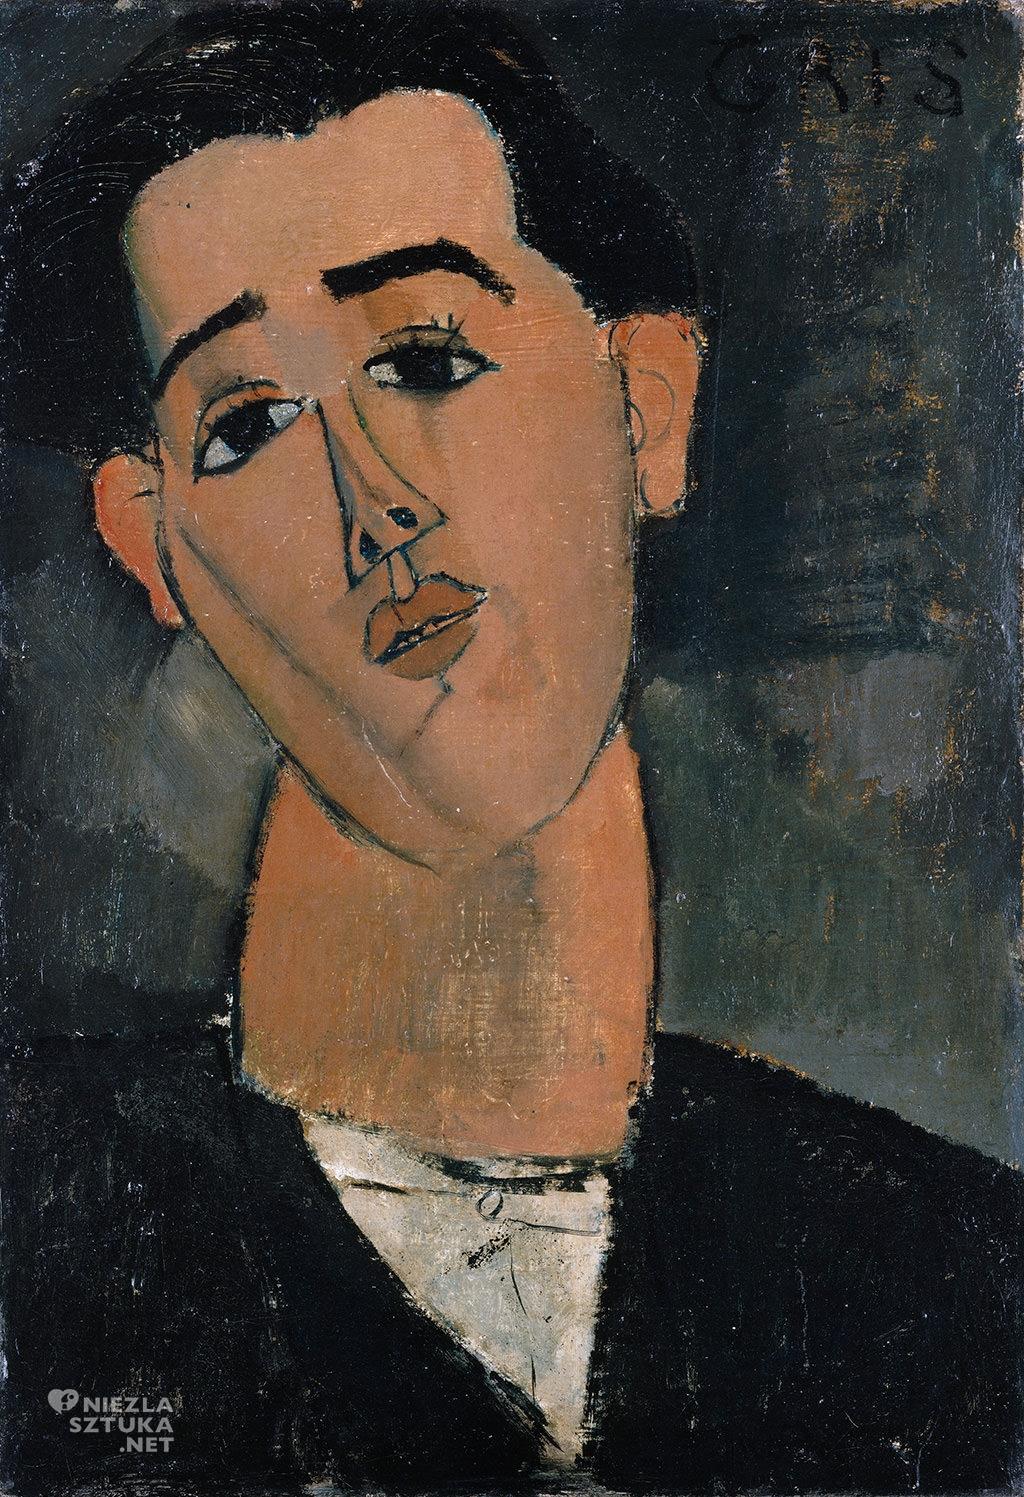 Amedeo Modigliani, Juan Gris, sztuka włoska, malarstwo olejne, portret, ekspresjonizm, sztuka nowoczesna, Ecole de Paris, Niezła Sztuka